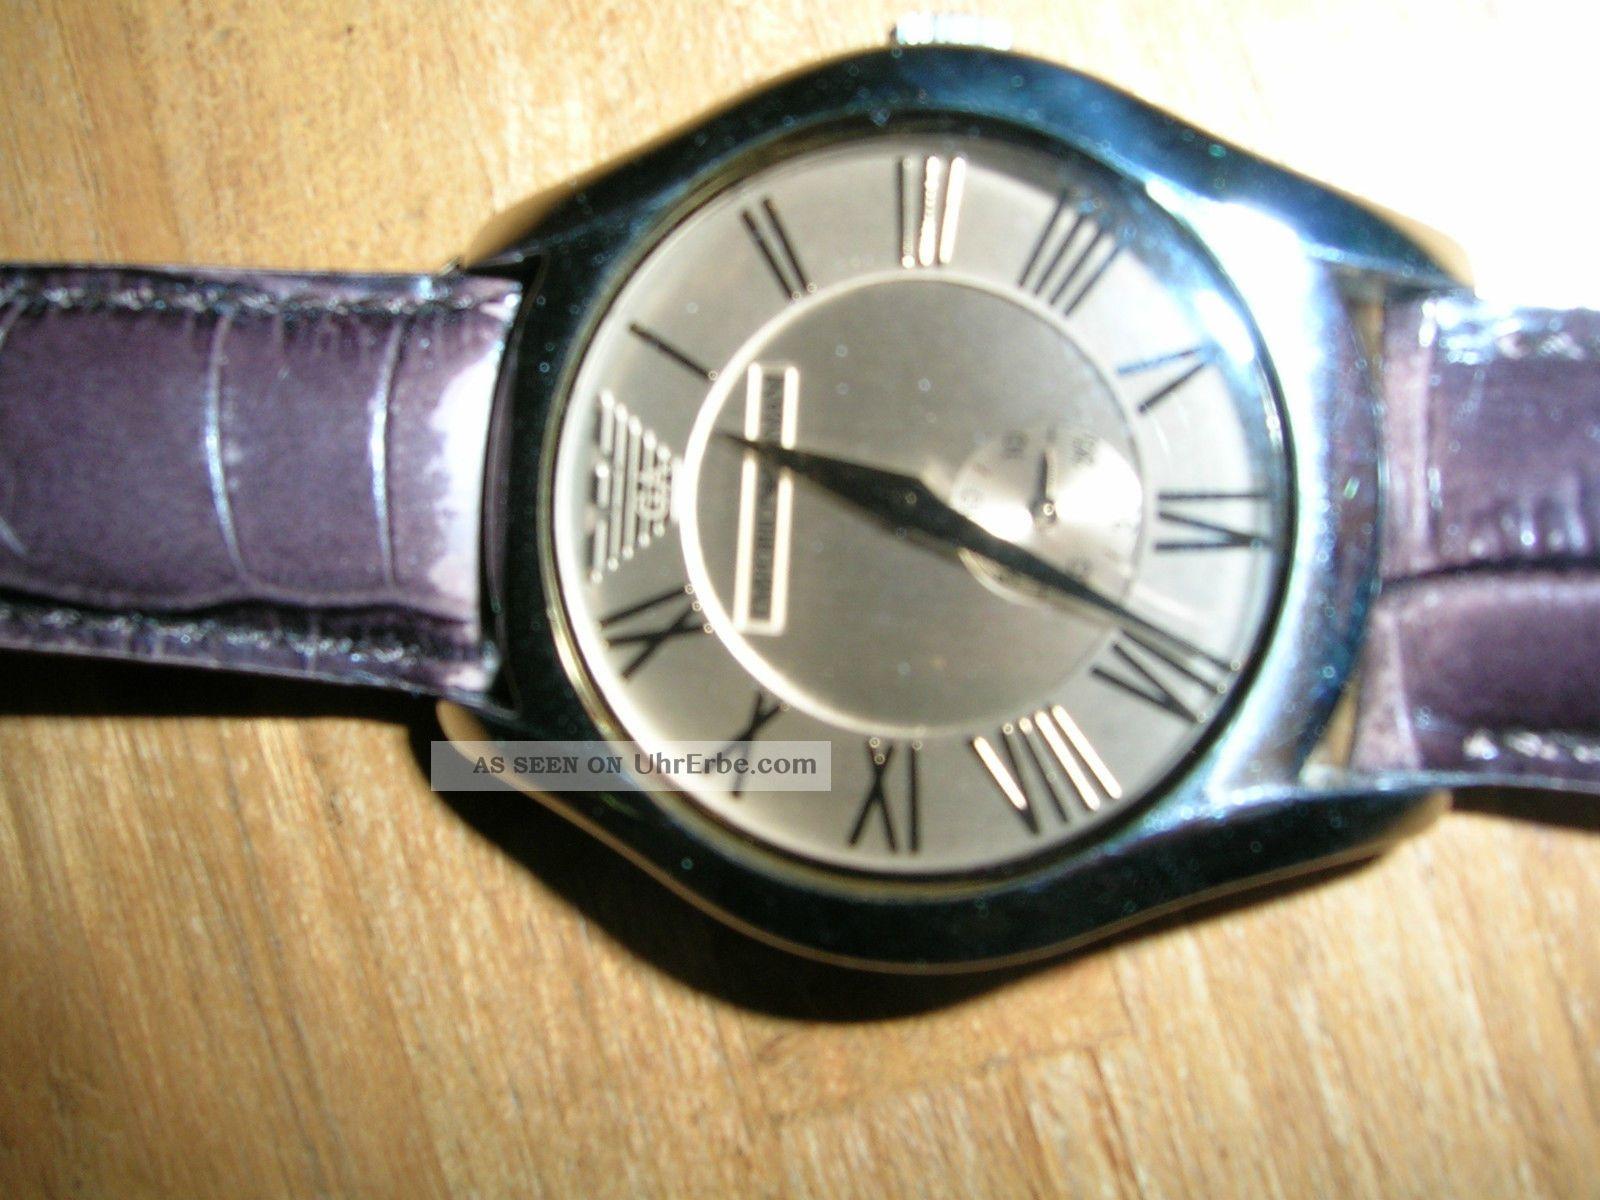 Emporio Armani Damen Armbanduhr Mit Braunem Lederarmband Armbanduhren Bild